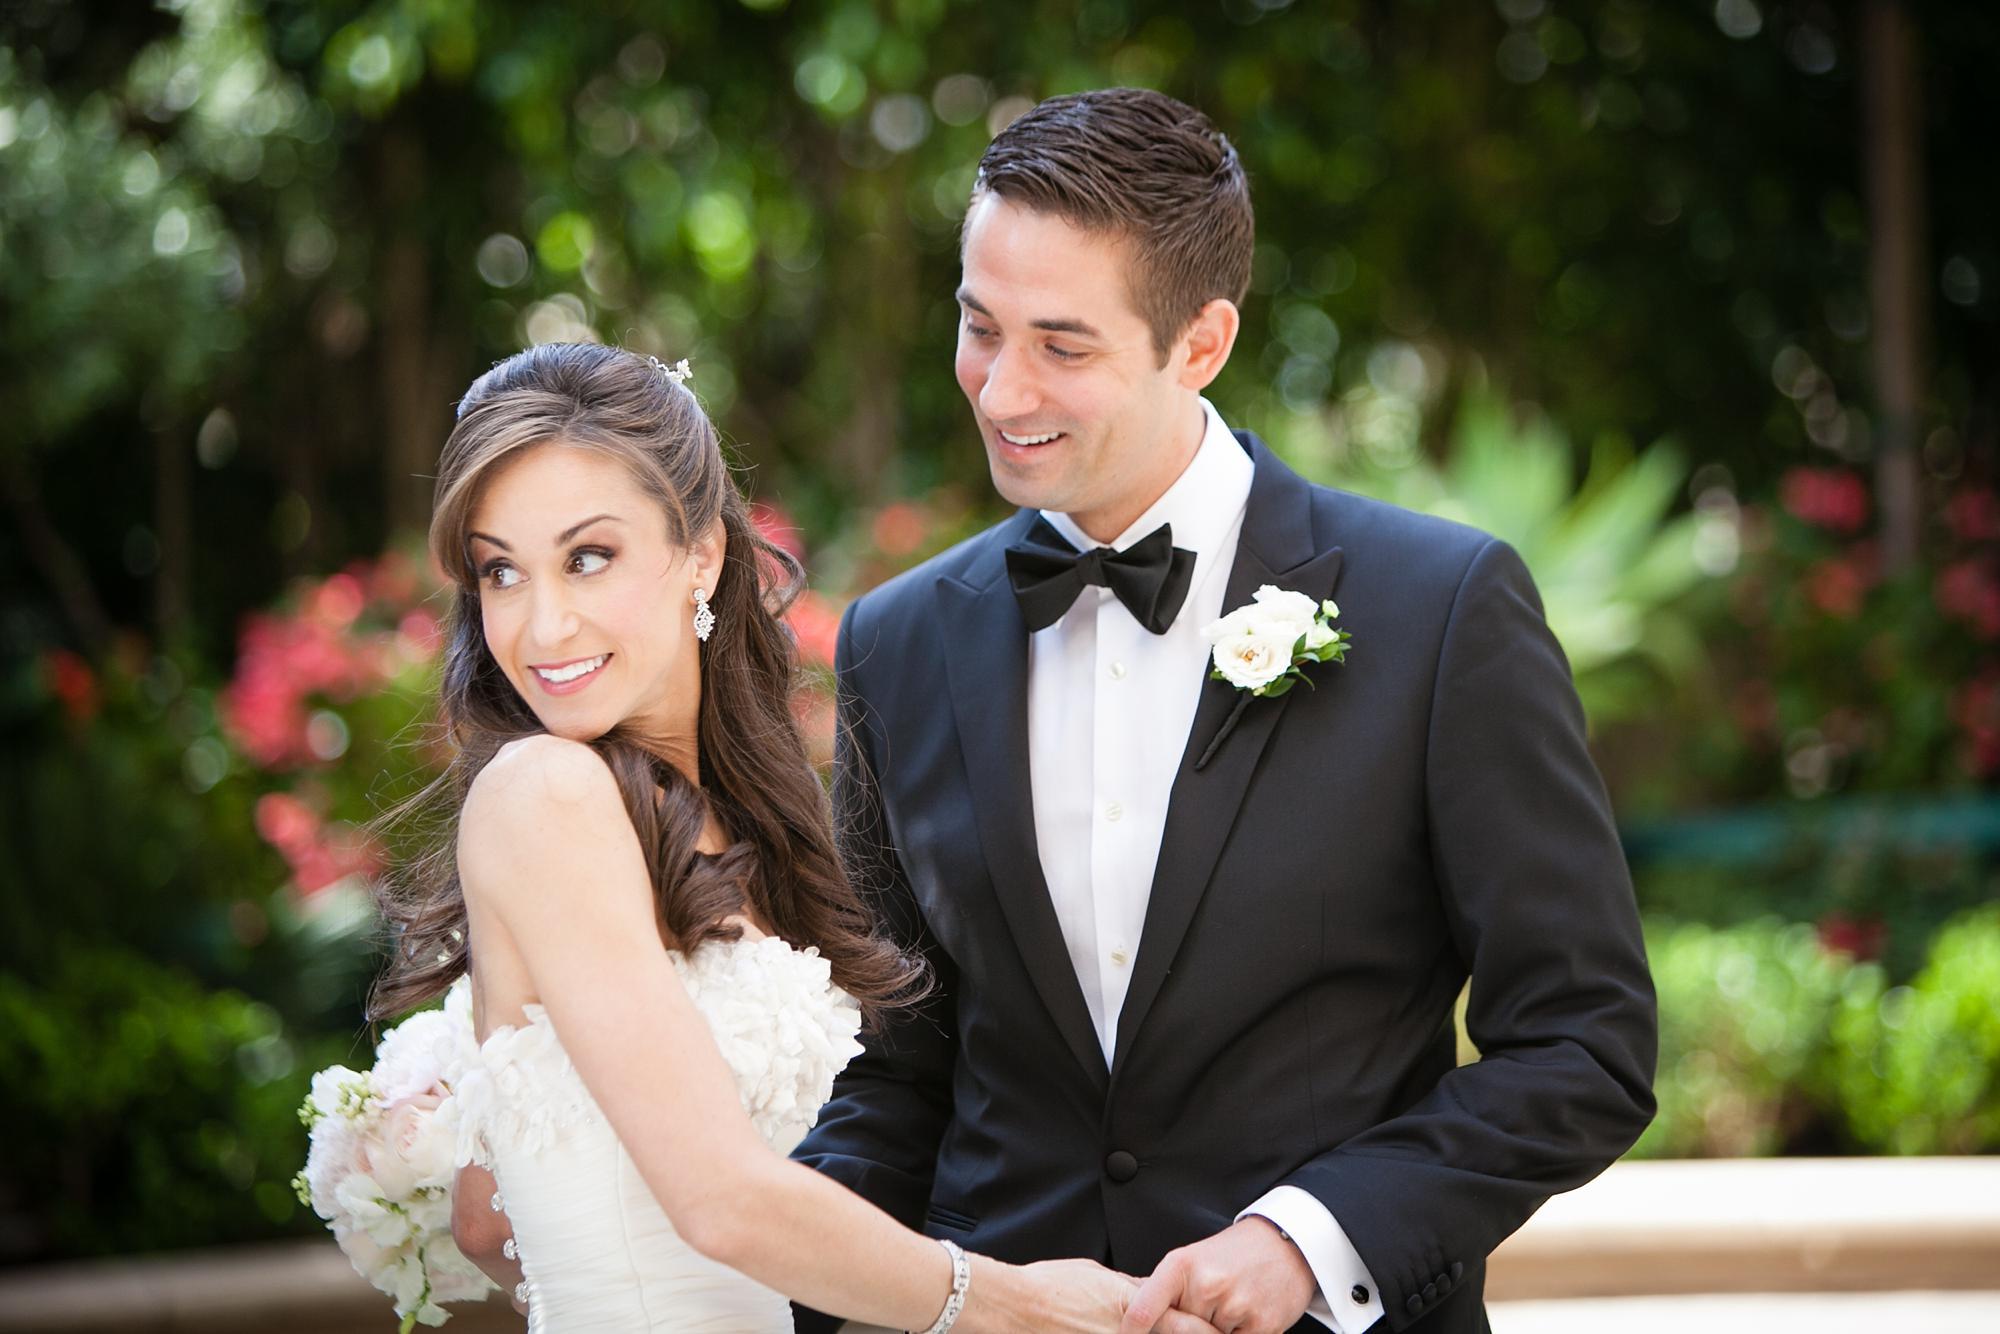 Four Seasons Beverly Hills Wedding | Miki & Sonja Photography | mikiandsonja.com